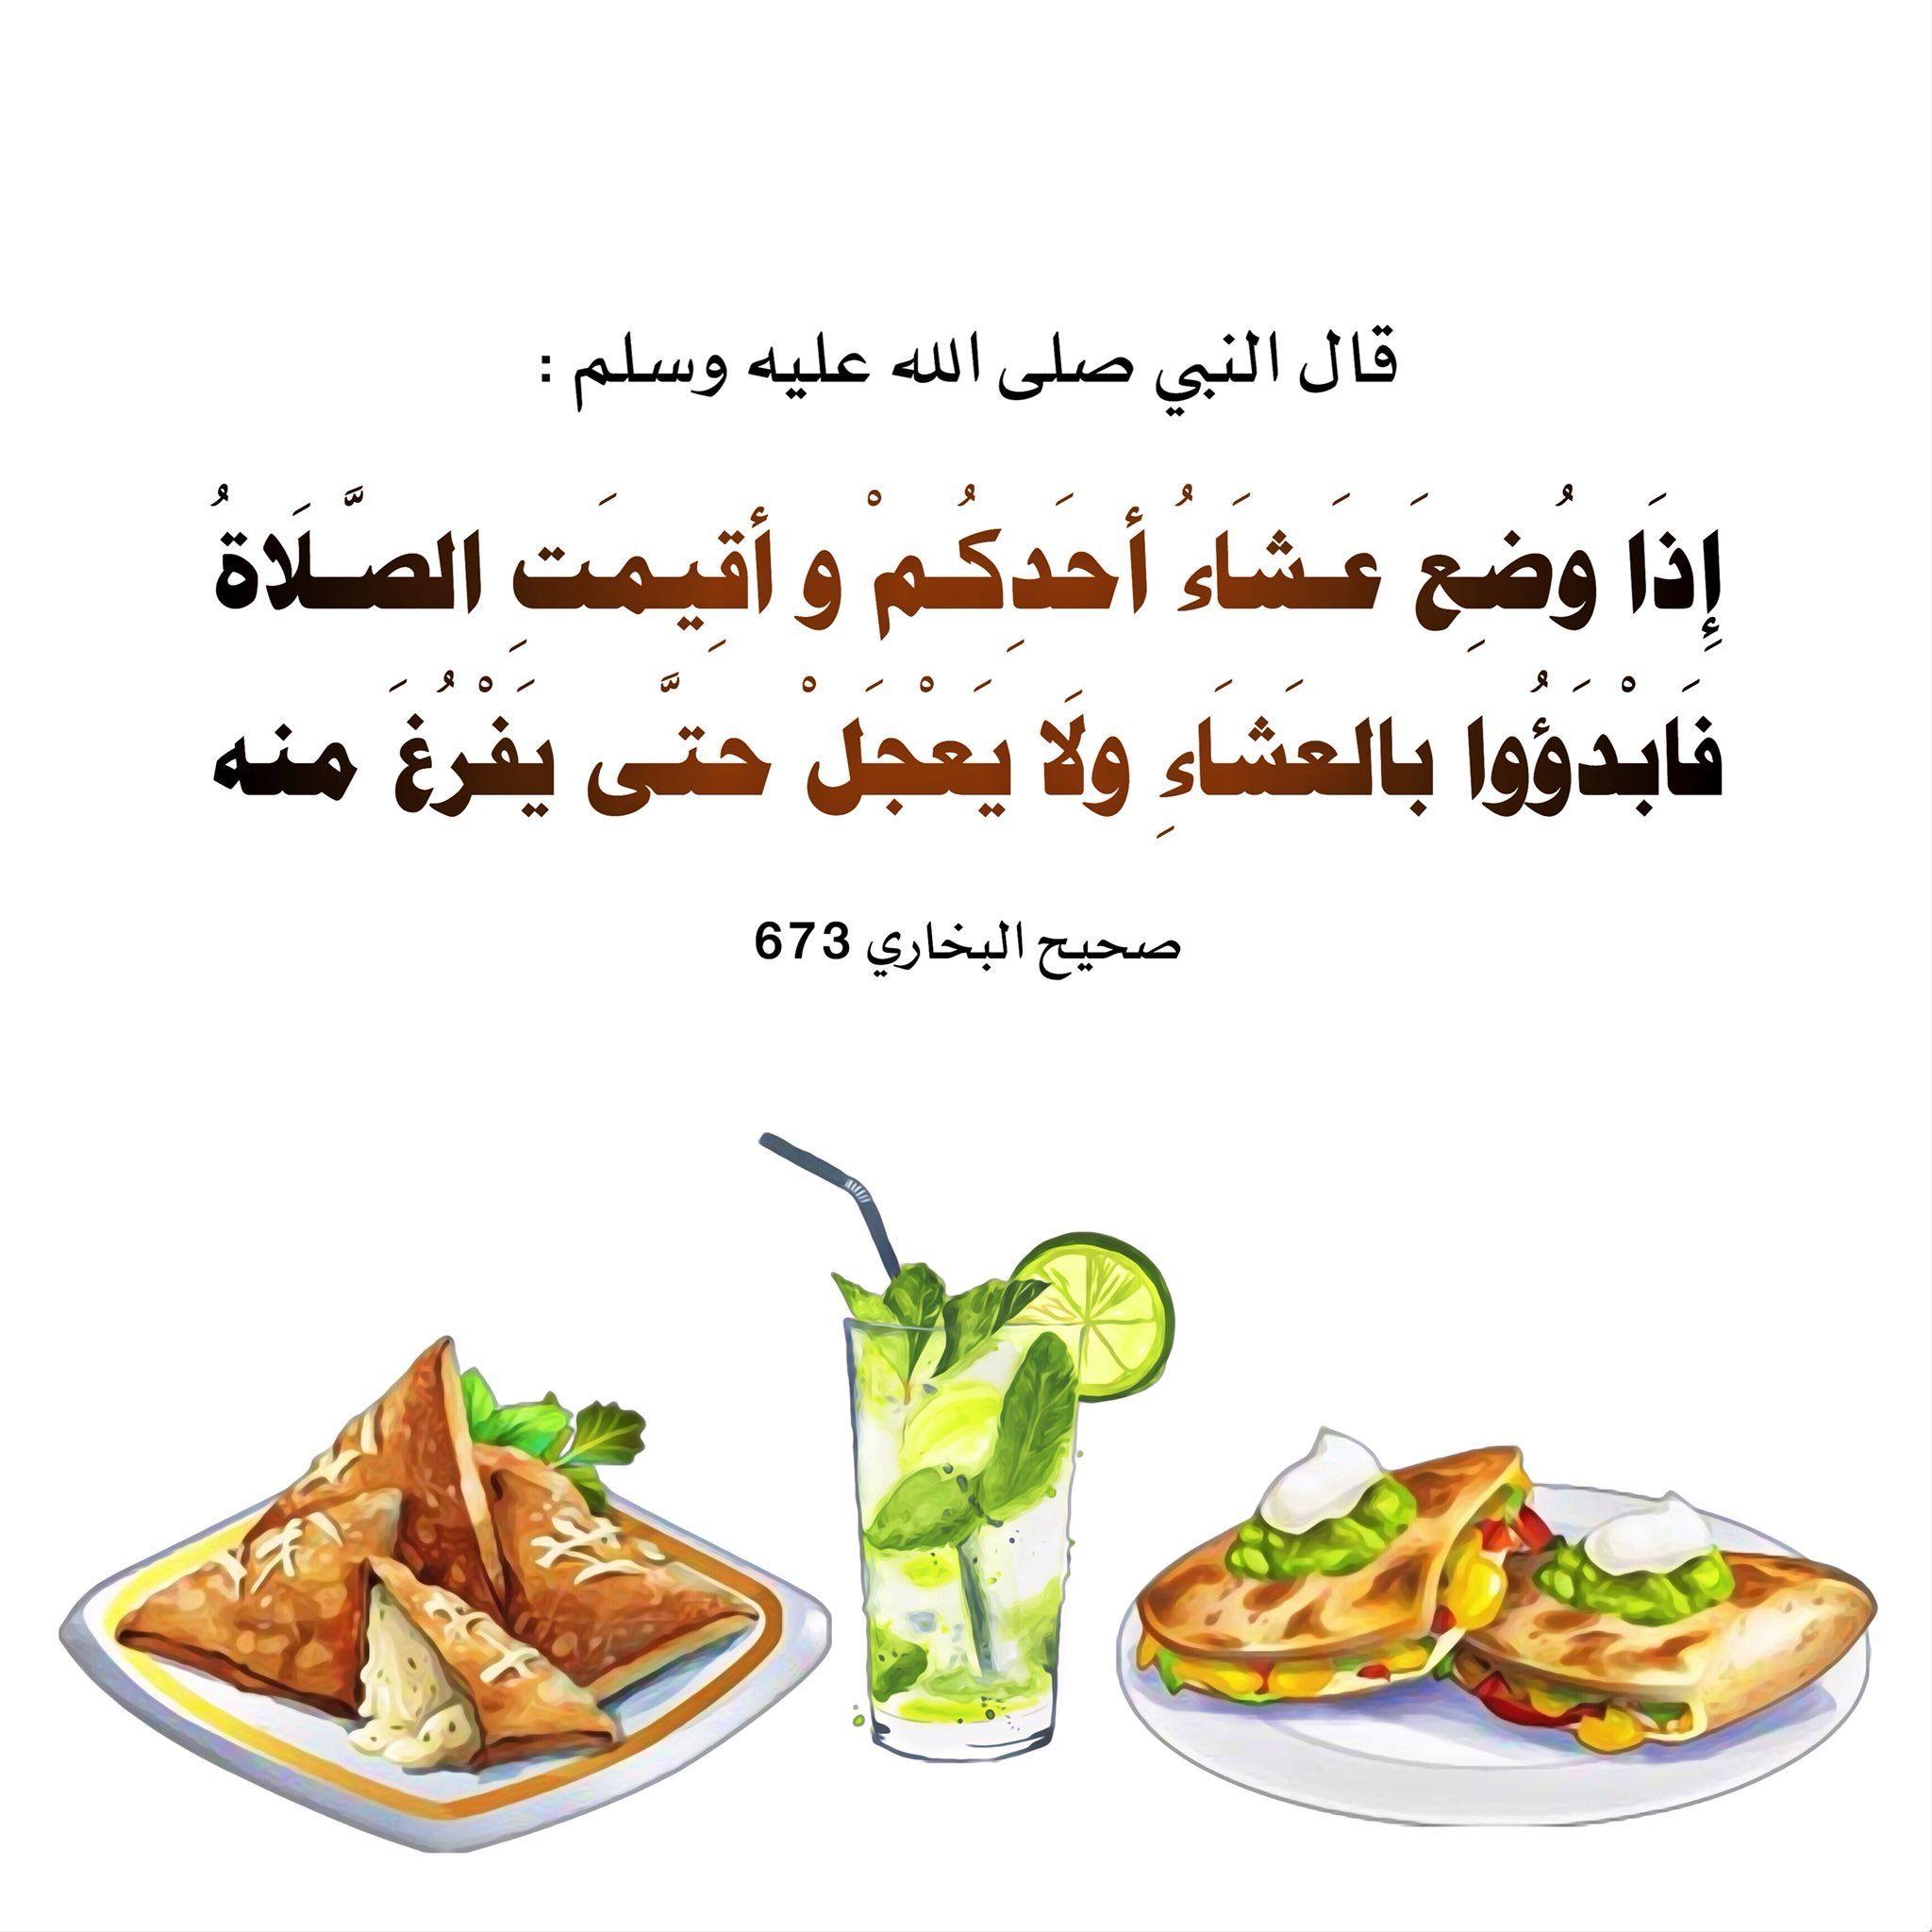 Pin By Miŕach Maŕia On أحاديث نبوية Ahadith Islamic Quotes Islamic Wallpaper